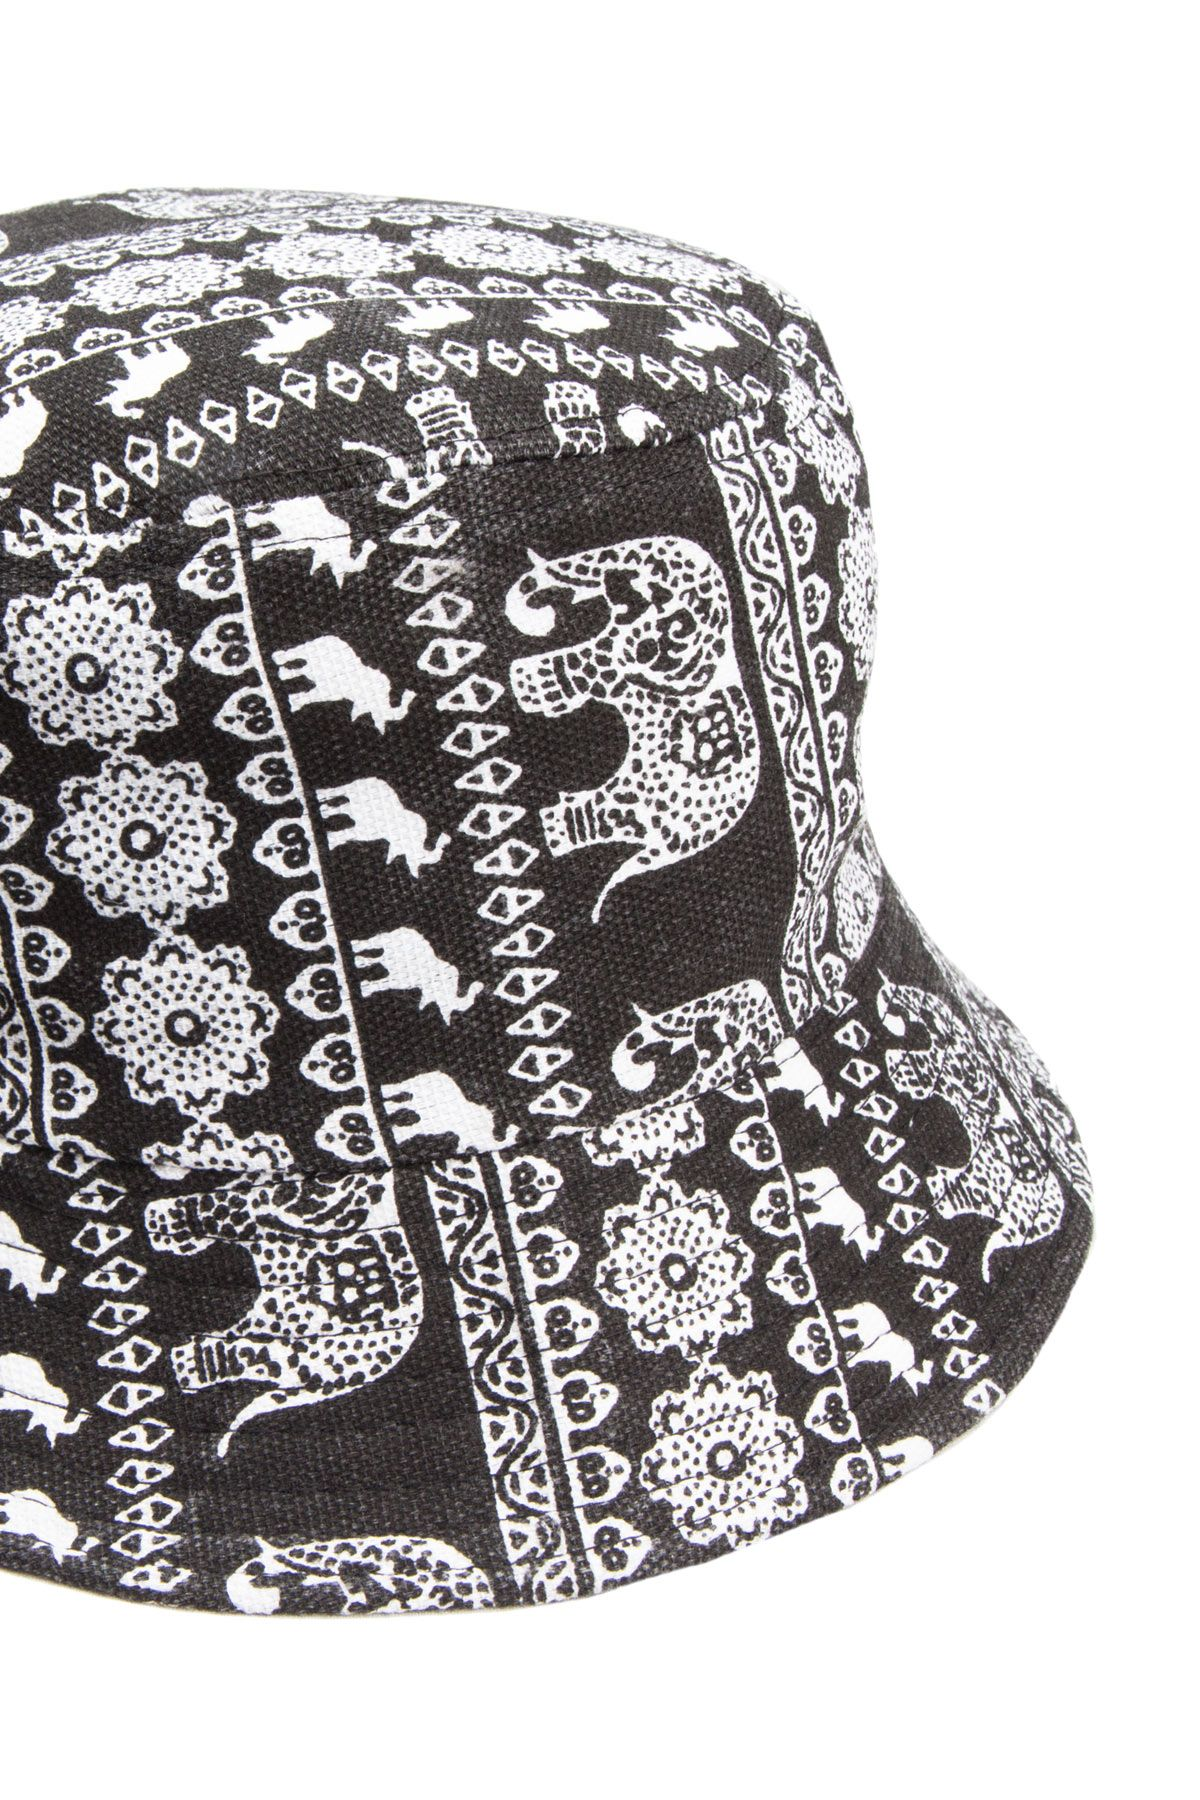 26c5d1afa77 Black Elephant Print Bucket Hat - Ragstock